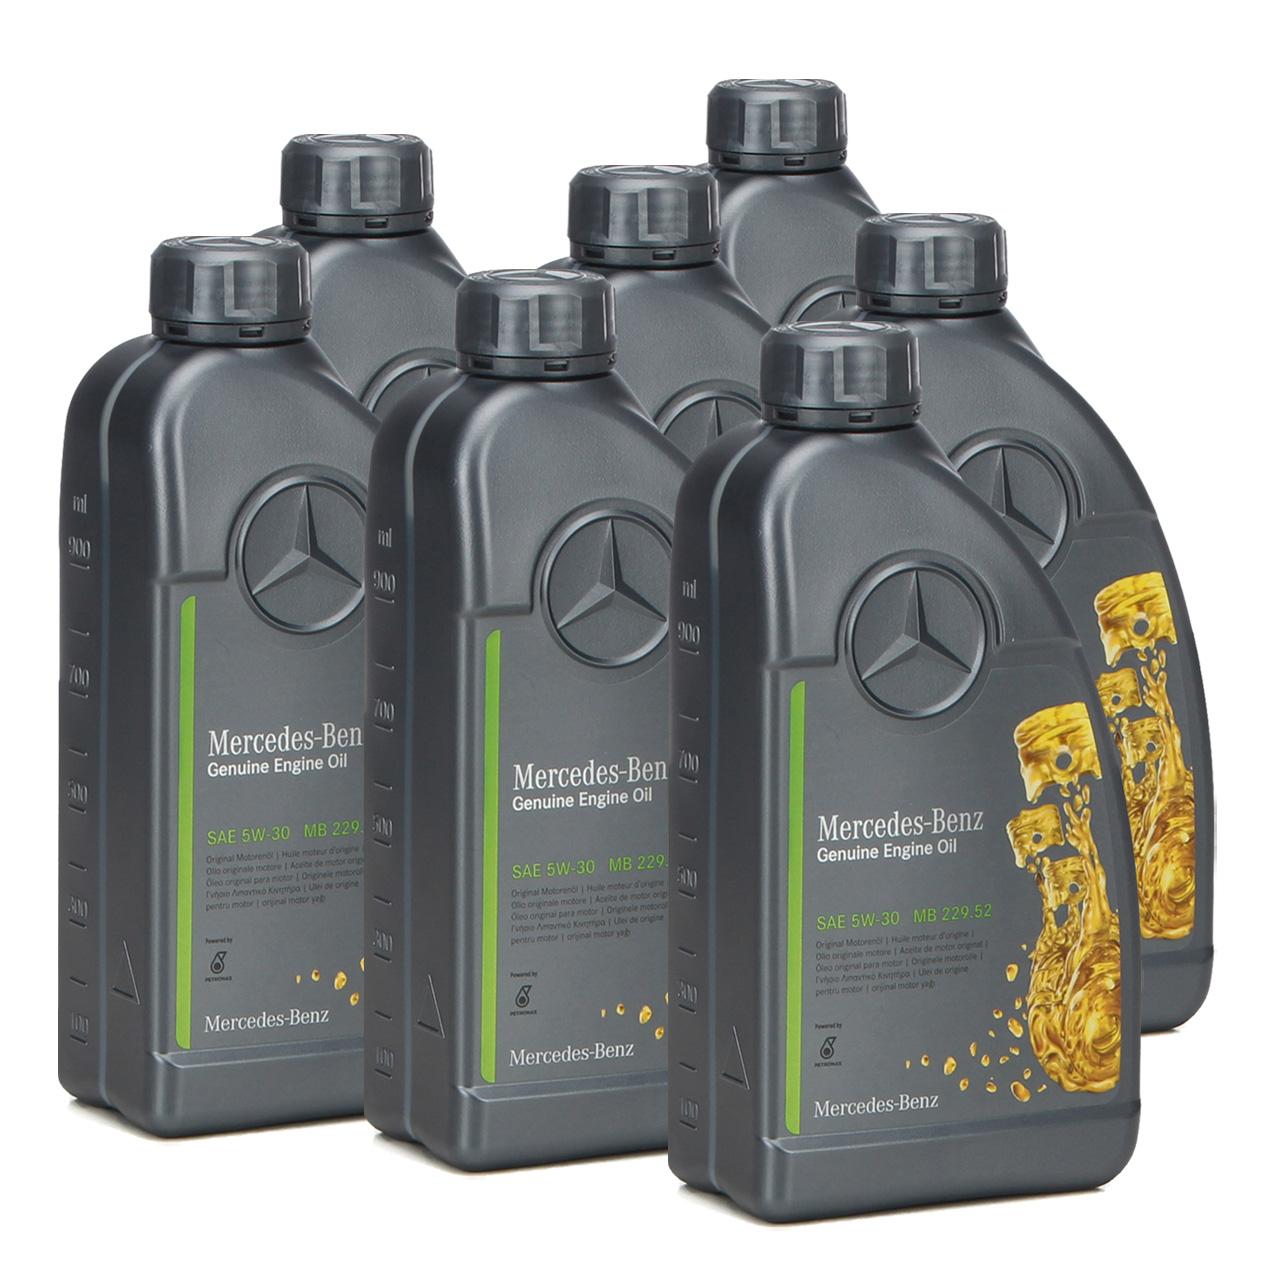 7L 7 Liter ORIGINAL Mercedes-Benz Motoröl ÖL 5W30 5W-30 MB 229.52 000989950211